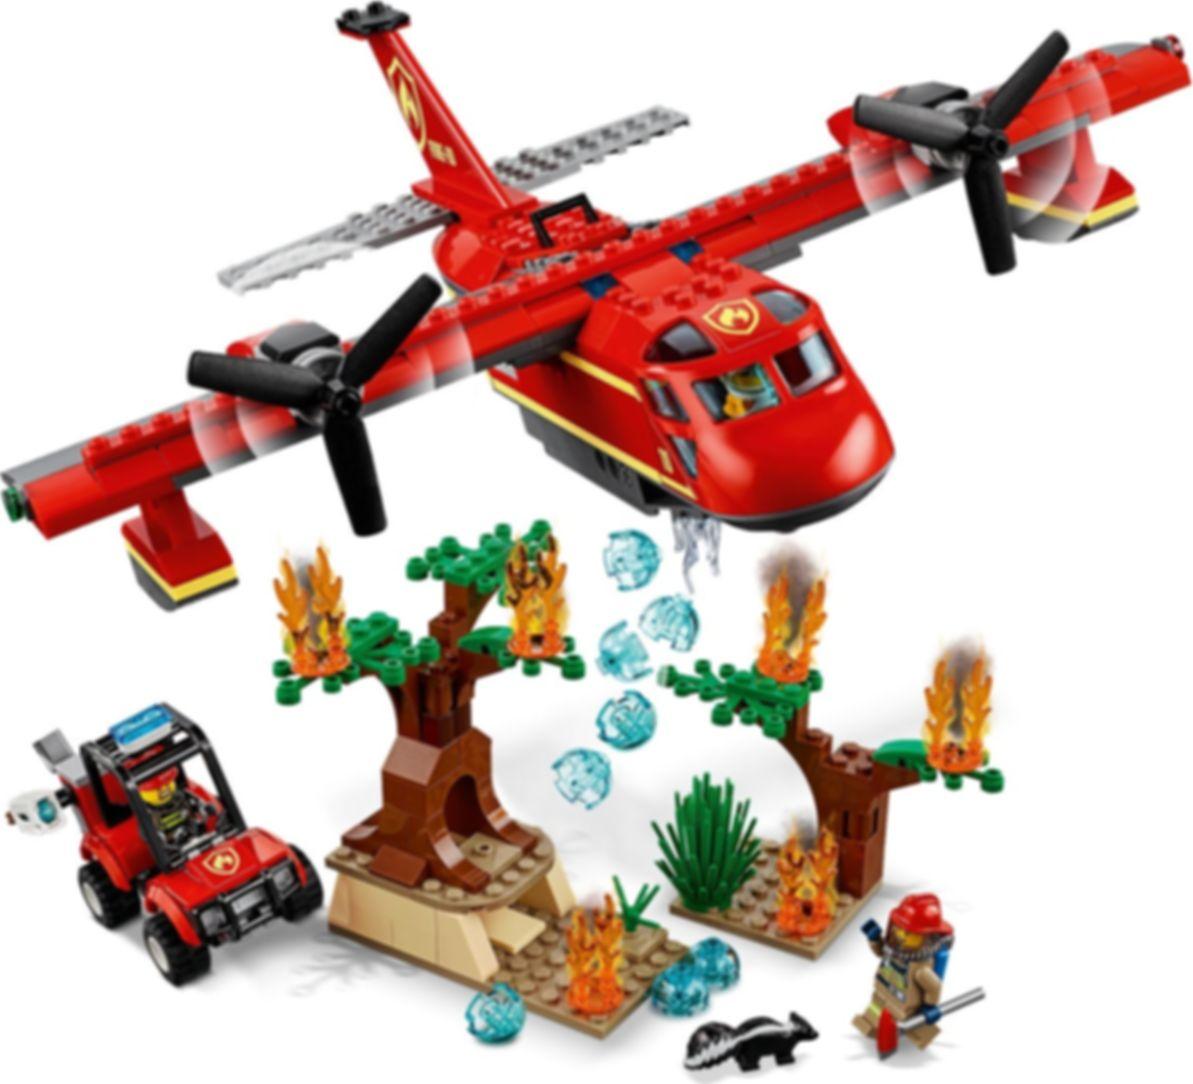 LEGO® City Fire Plane gameplay